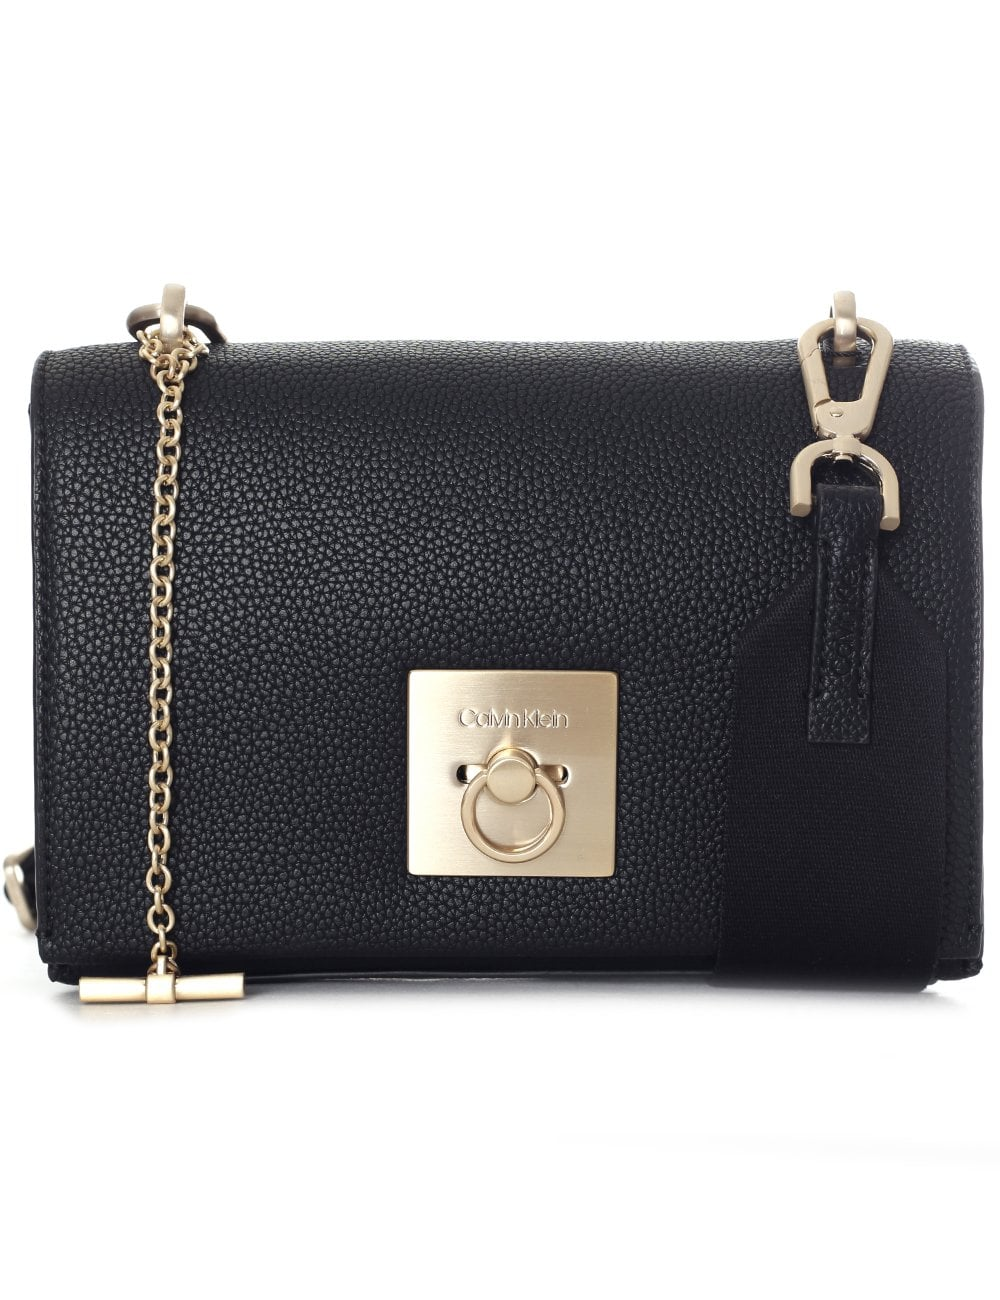 Calvin Klein Women's CK Lock Medium Flap Crossbody Bag